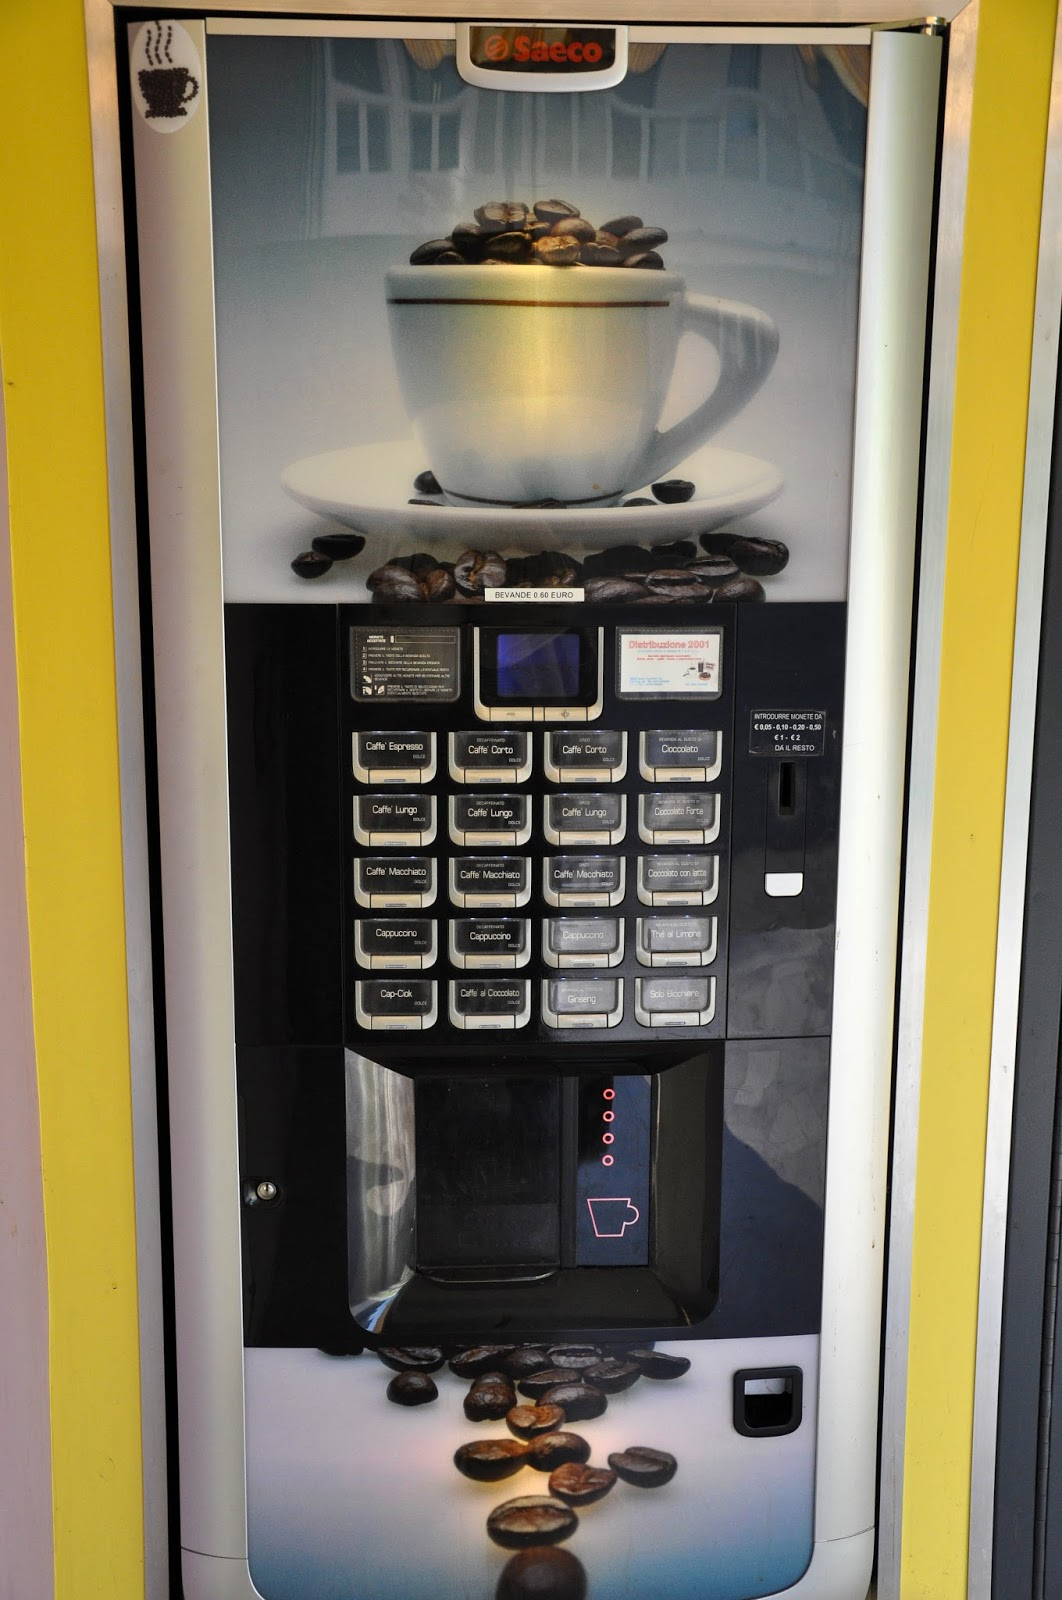 Gourmet Coffee Vending Machine